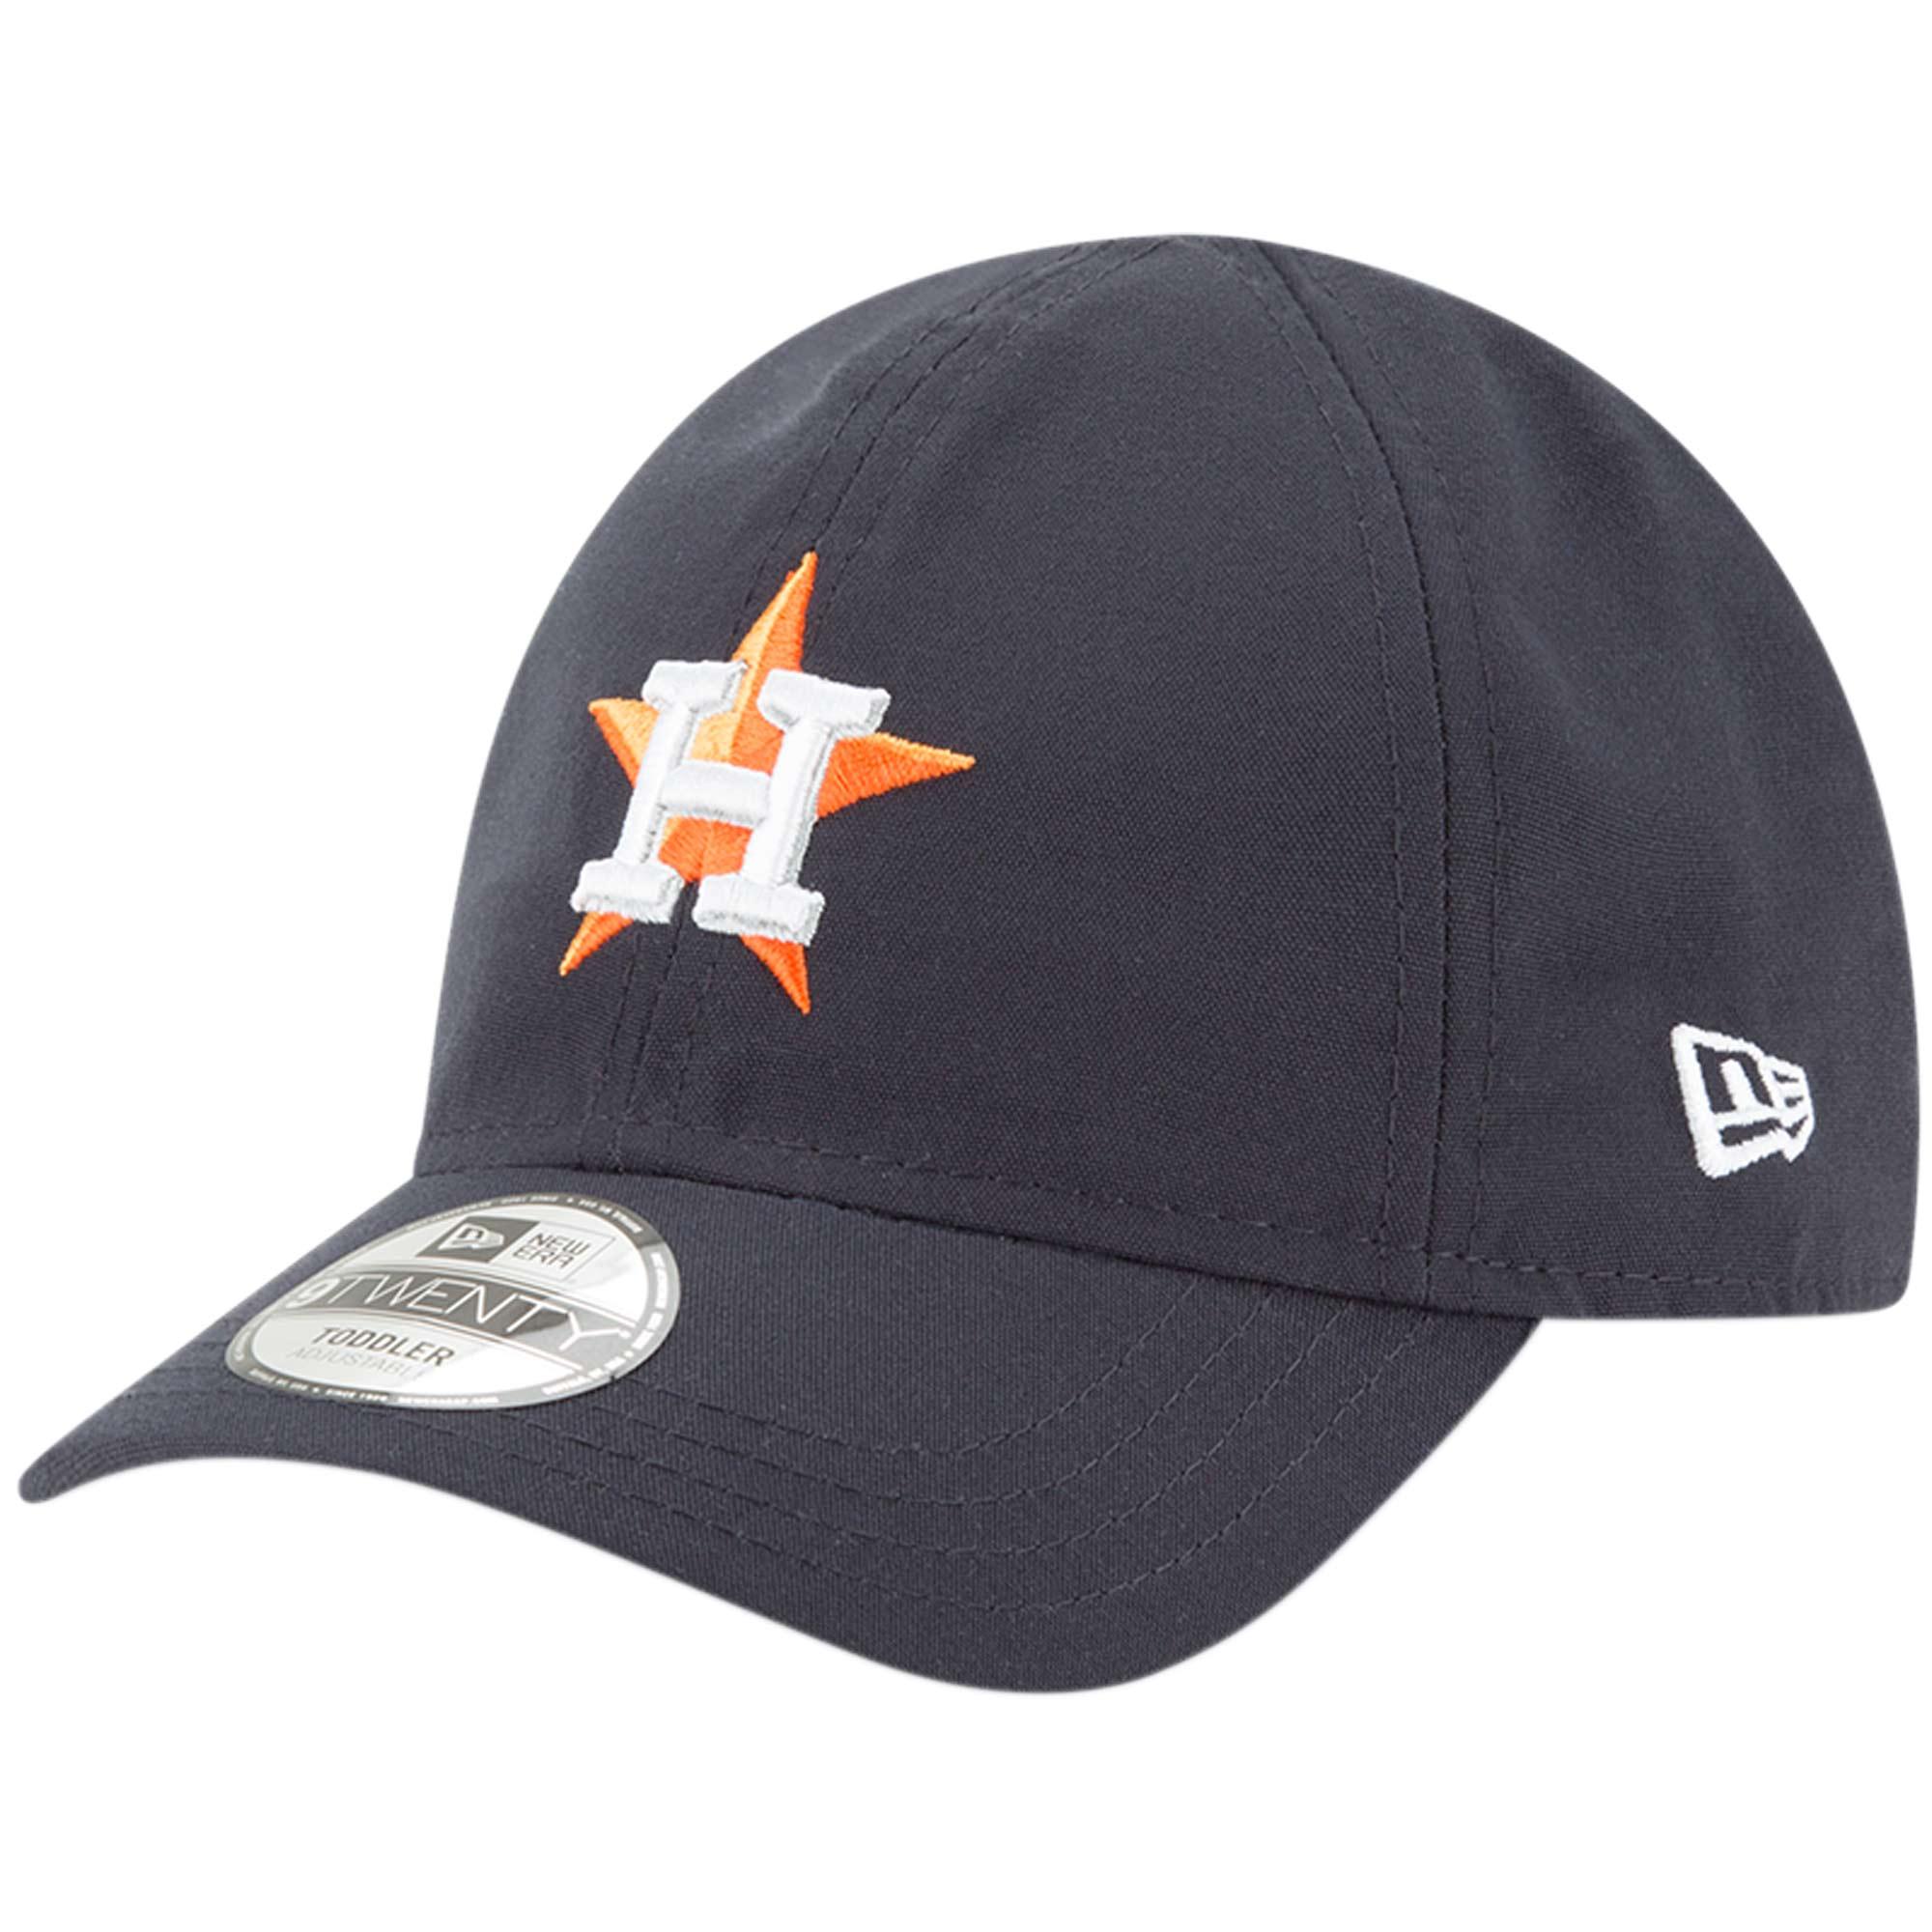 Houston Astros New Era Toddler My 1st 9TWENTY Adjustable Hat - Navy - OSFA